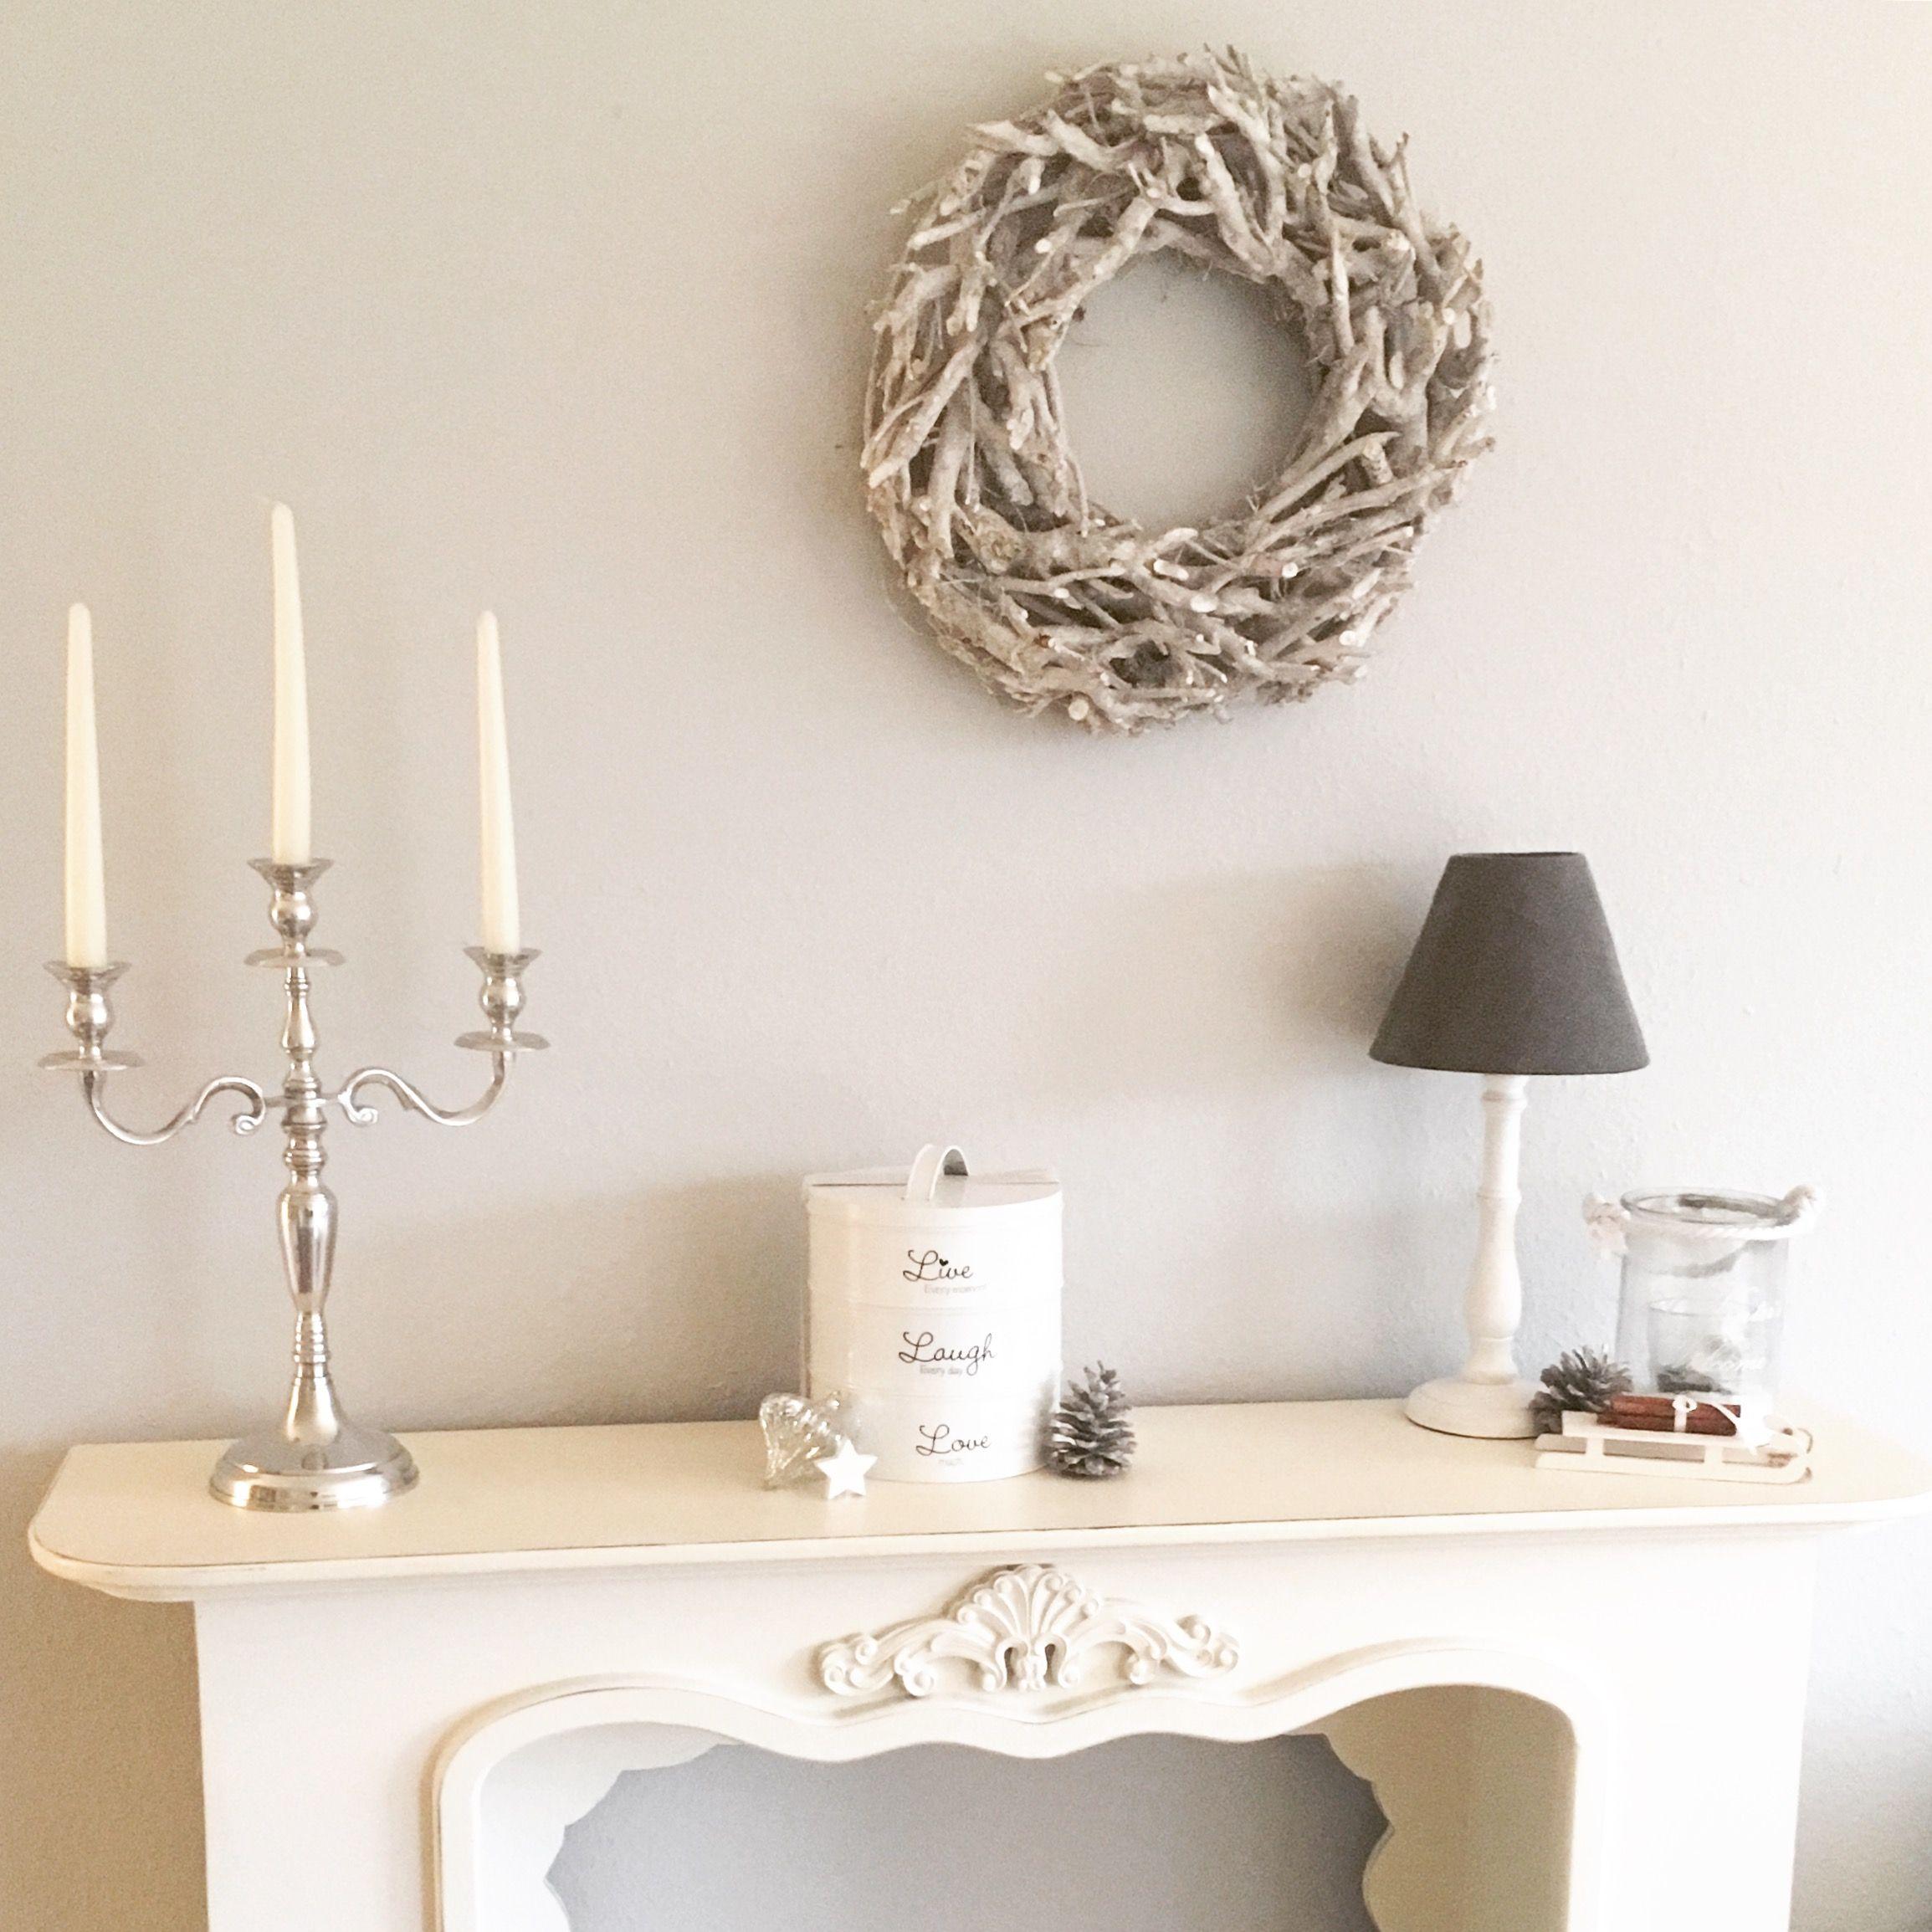 Kaminumrandung Kaminkonsole Whiteliving Wohnen In Weiss Kerzenleuchter Driftwood Treibholz Kranz Livingroom Wohnzimmer Riviera Maison